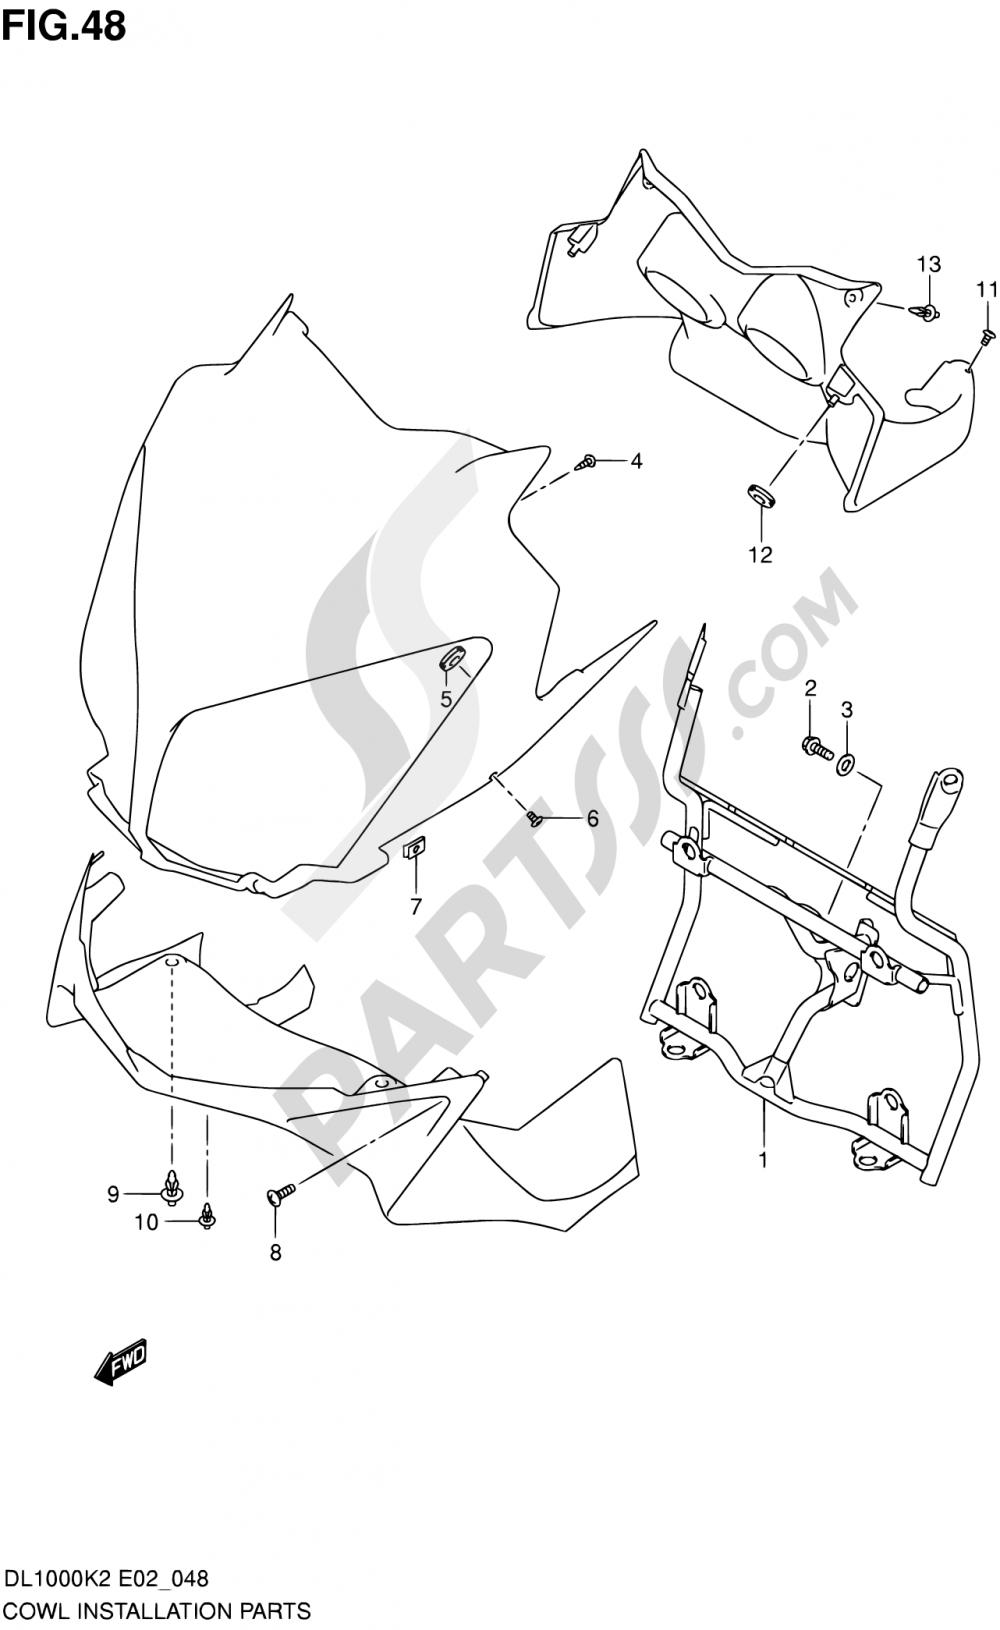 48 - COWL BODY INSTALLATION PARTS (MODEL K2/K3) Suzuki VSTROM DL1000 2002